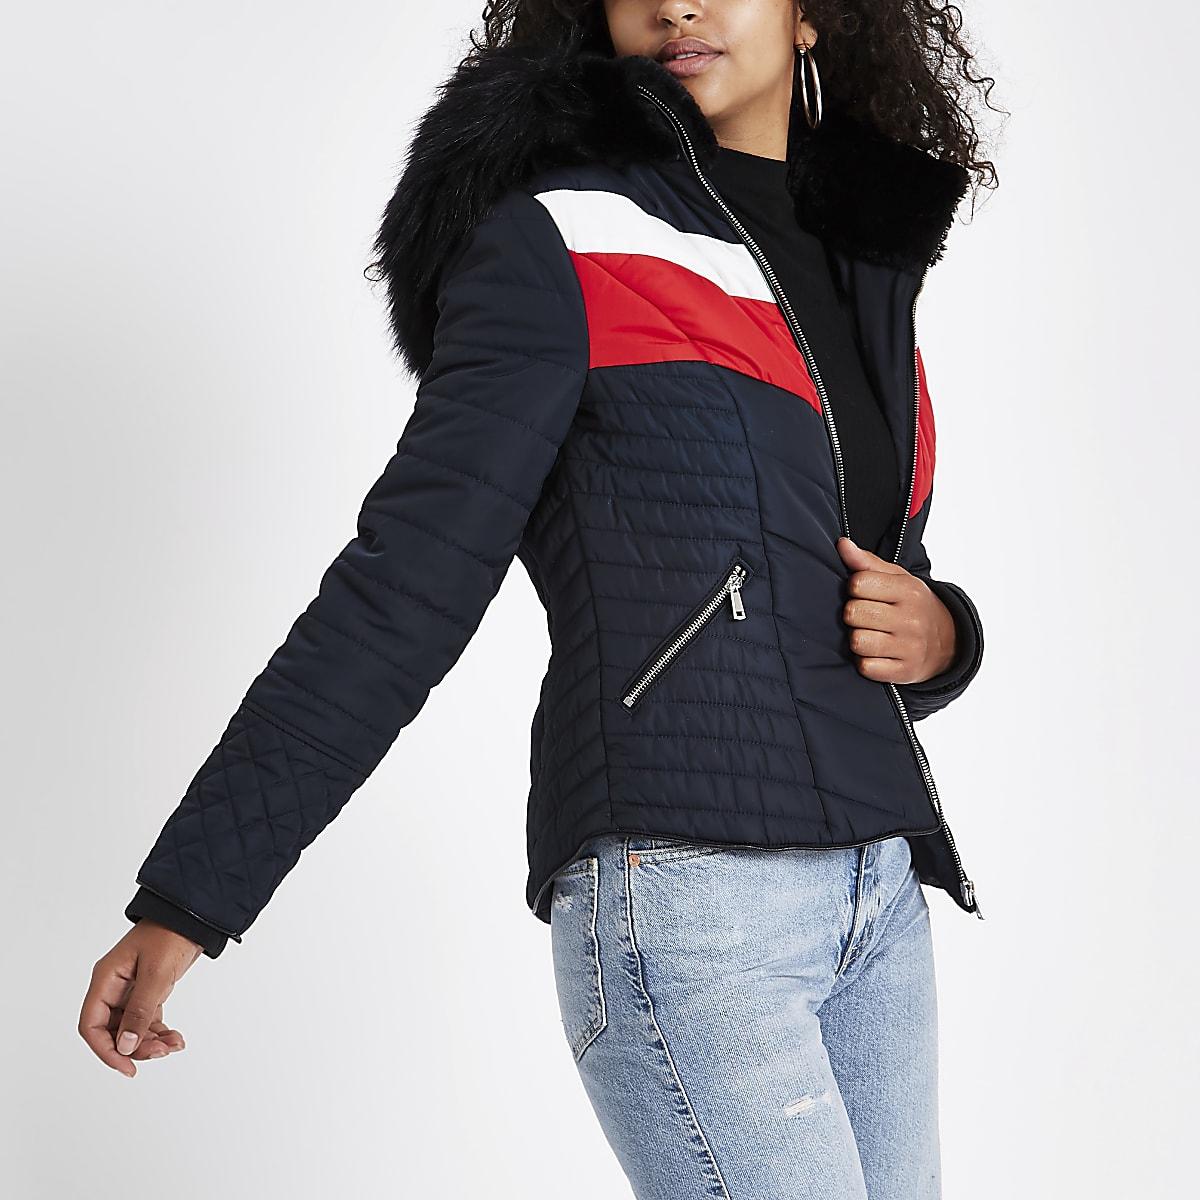 ec1bb857304 Navy faux fur hooded chevron padded jacket - Jackets - Coats & Jackets -  women